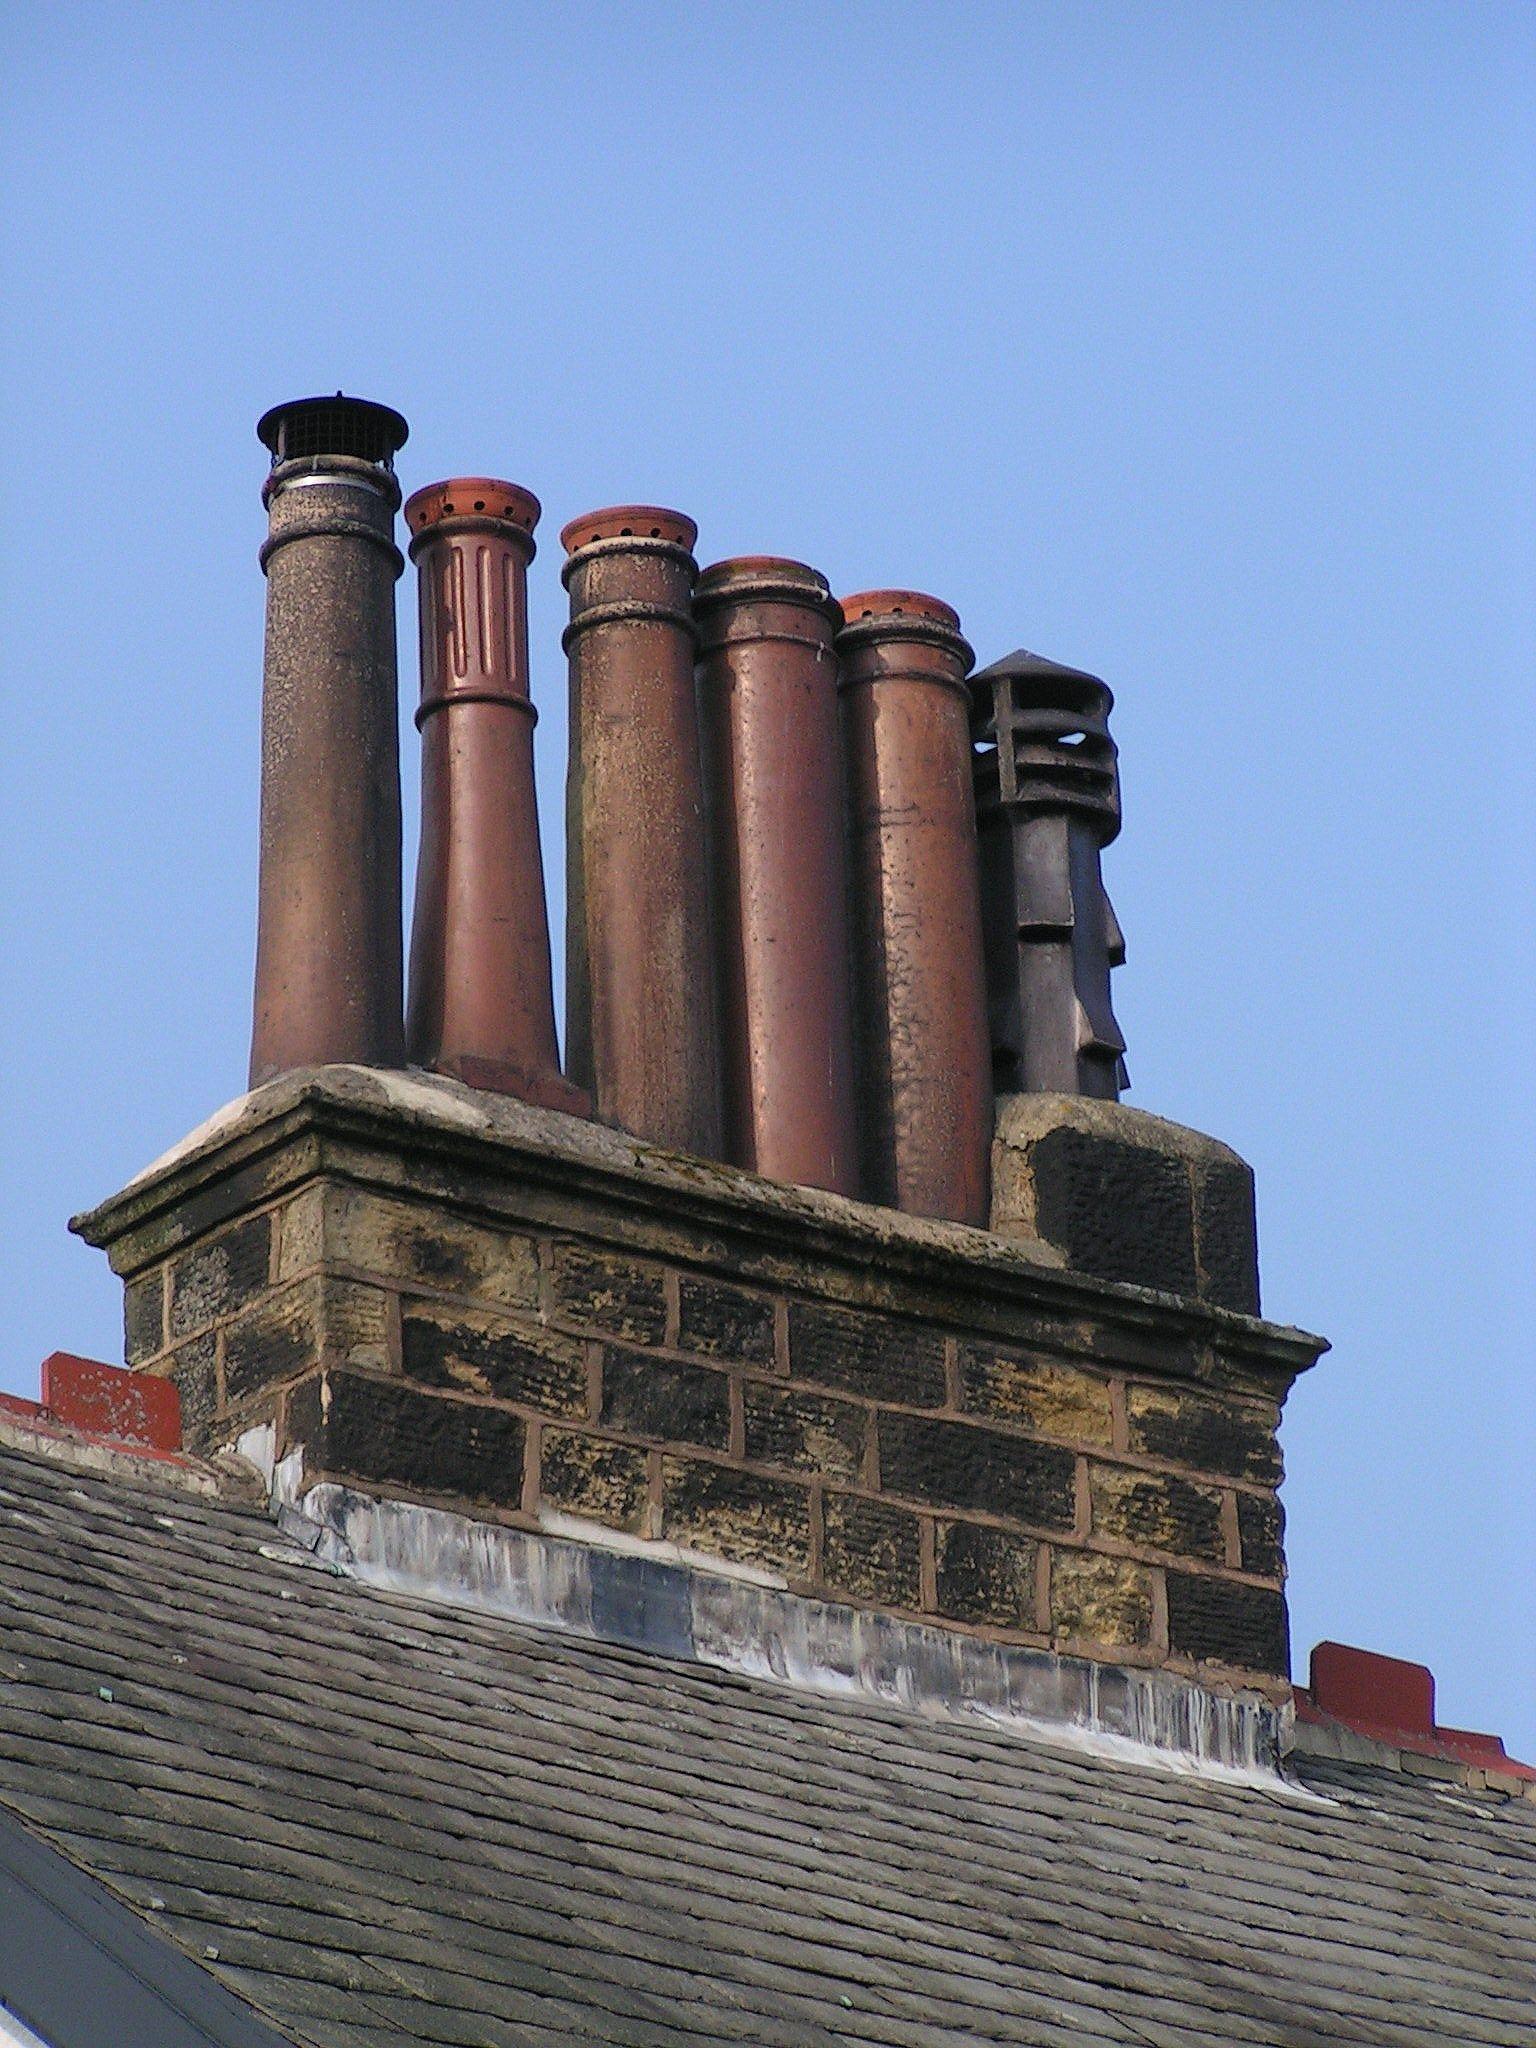 victorian chimneys - google search | chimneys in 2019